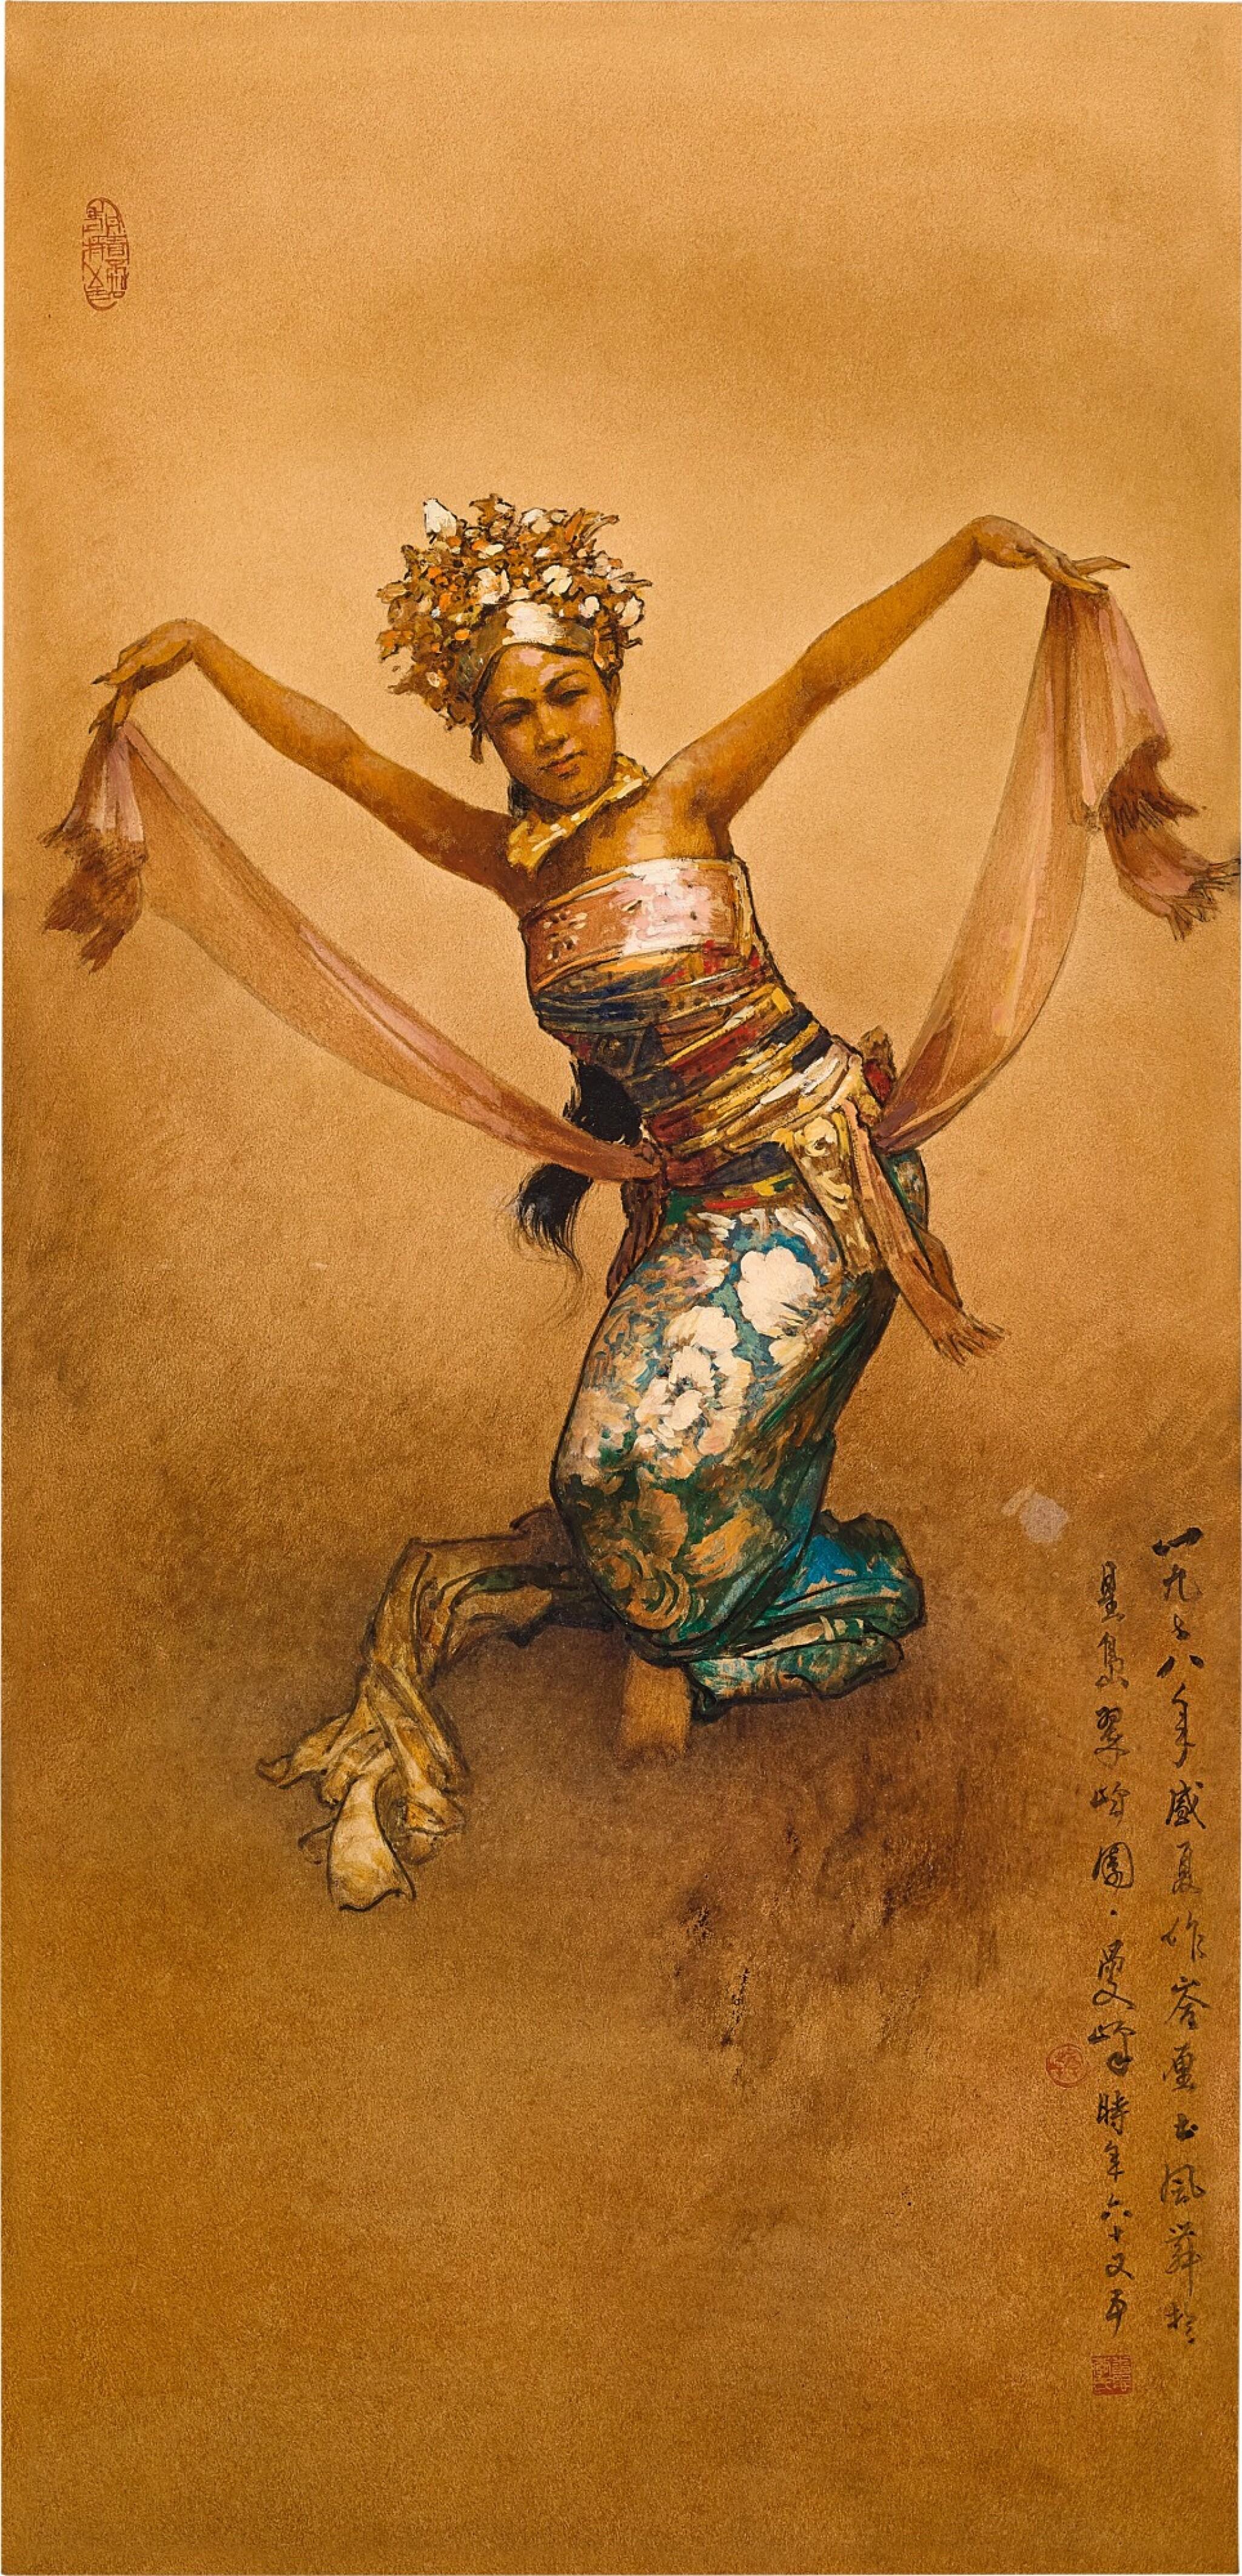 View full screen - View 1 of Lot 2009. Lee Man Fong 李曼峰   Balinese Dancer 巴厘舞者.